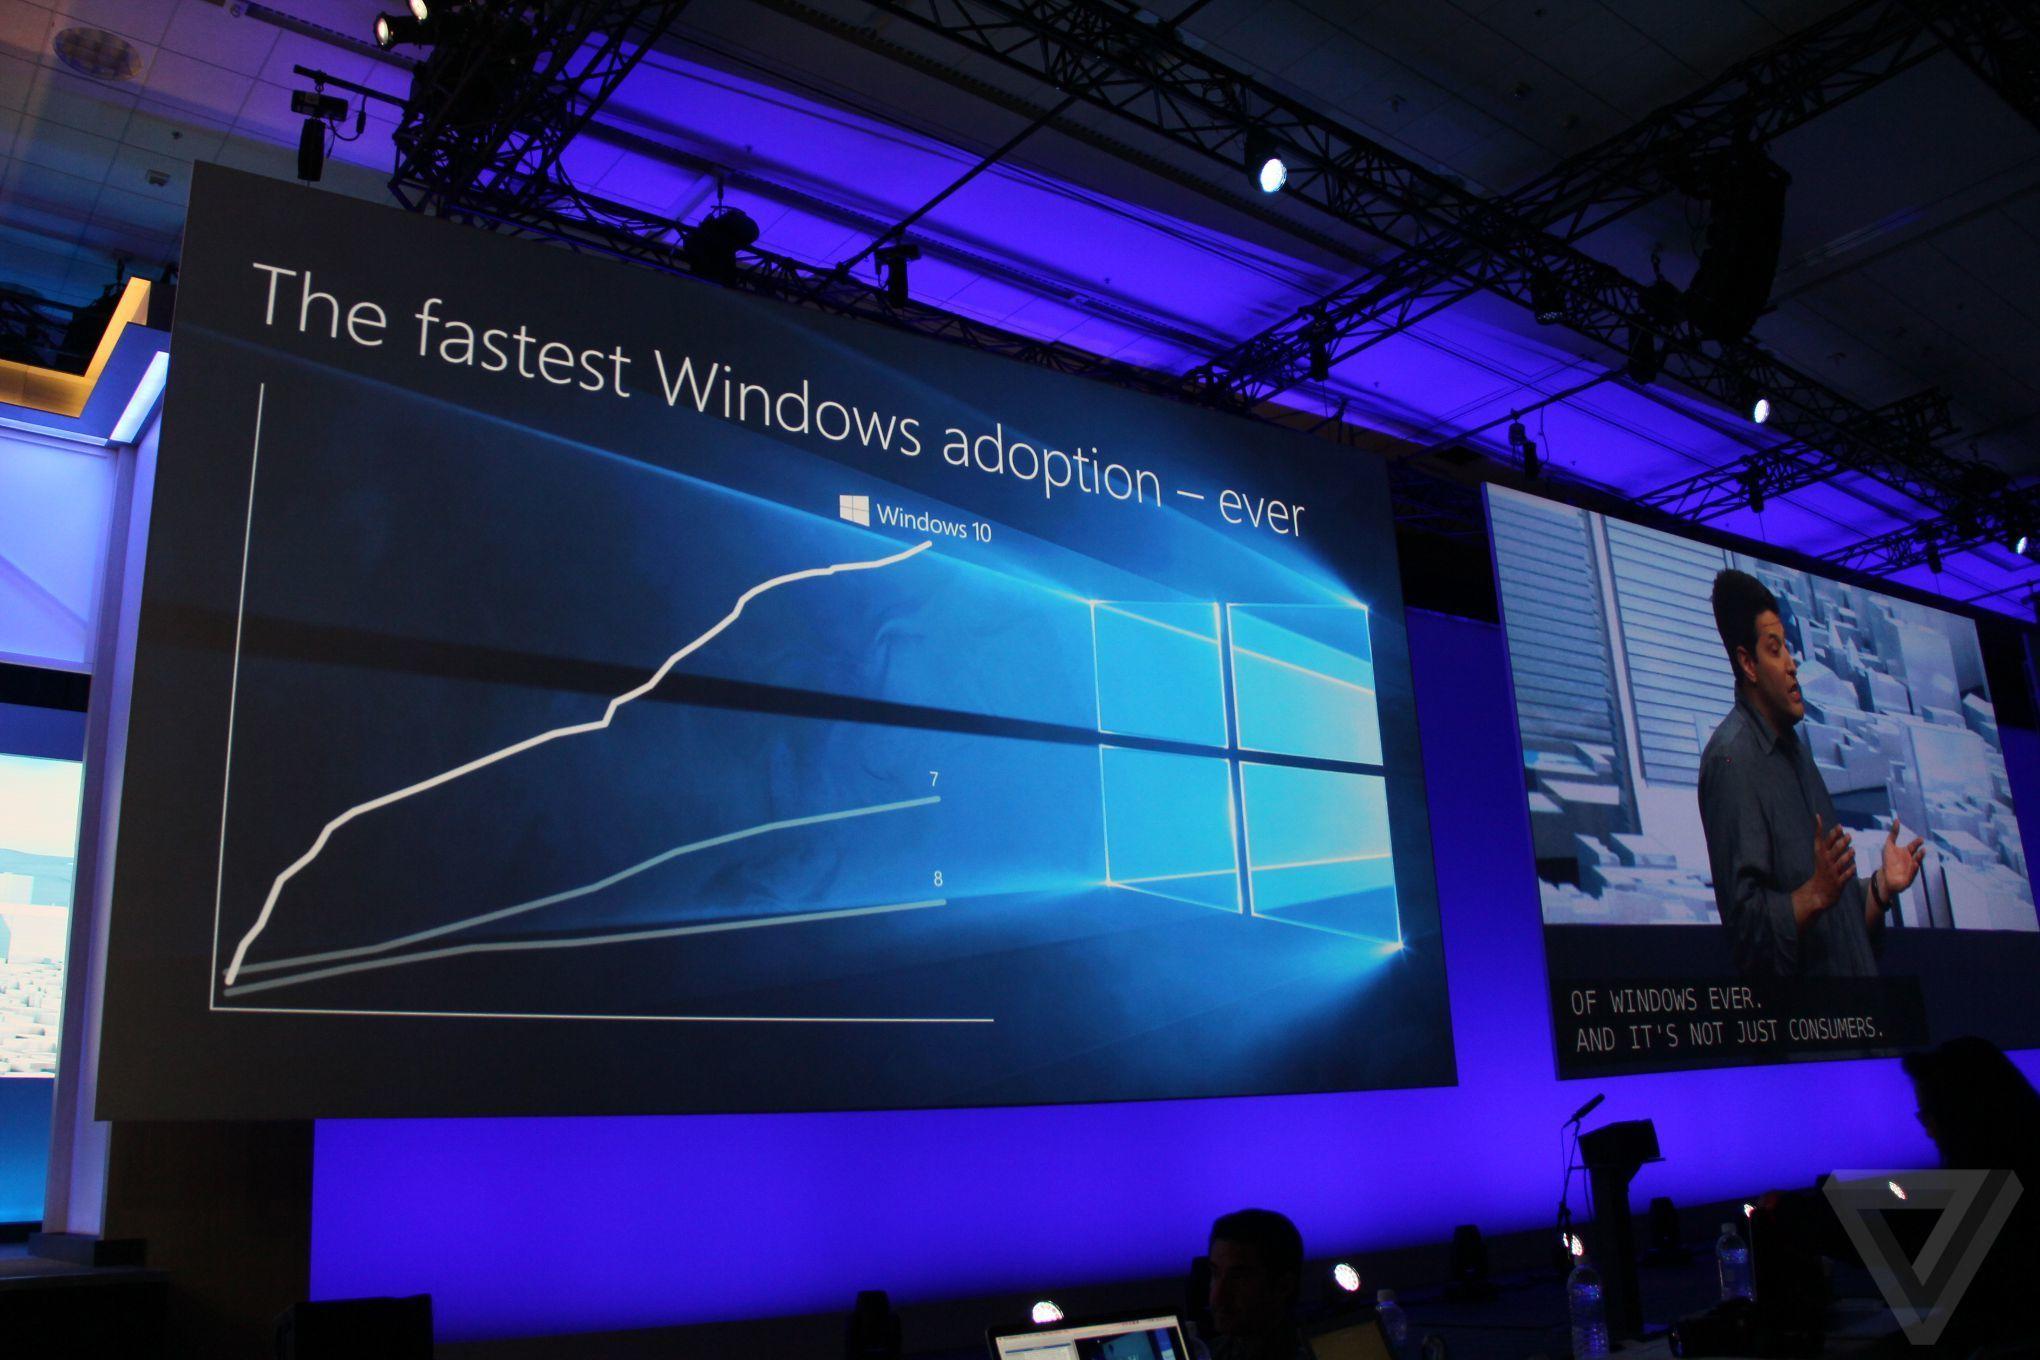 Build 2016 live stream, Windows 10 anniversary update | Product ...